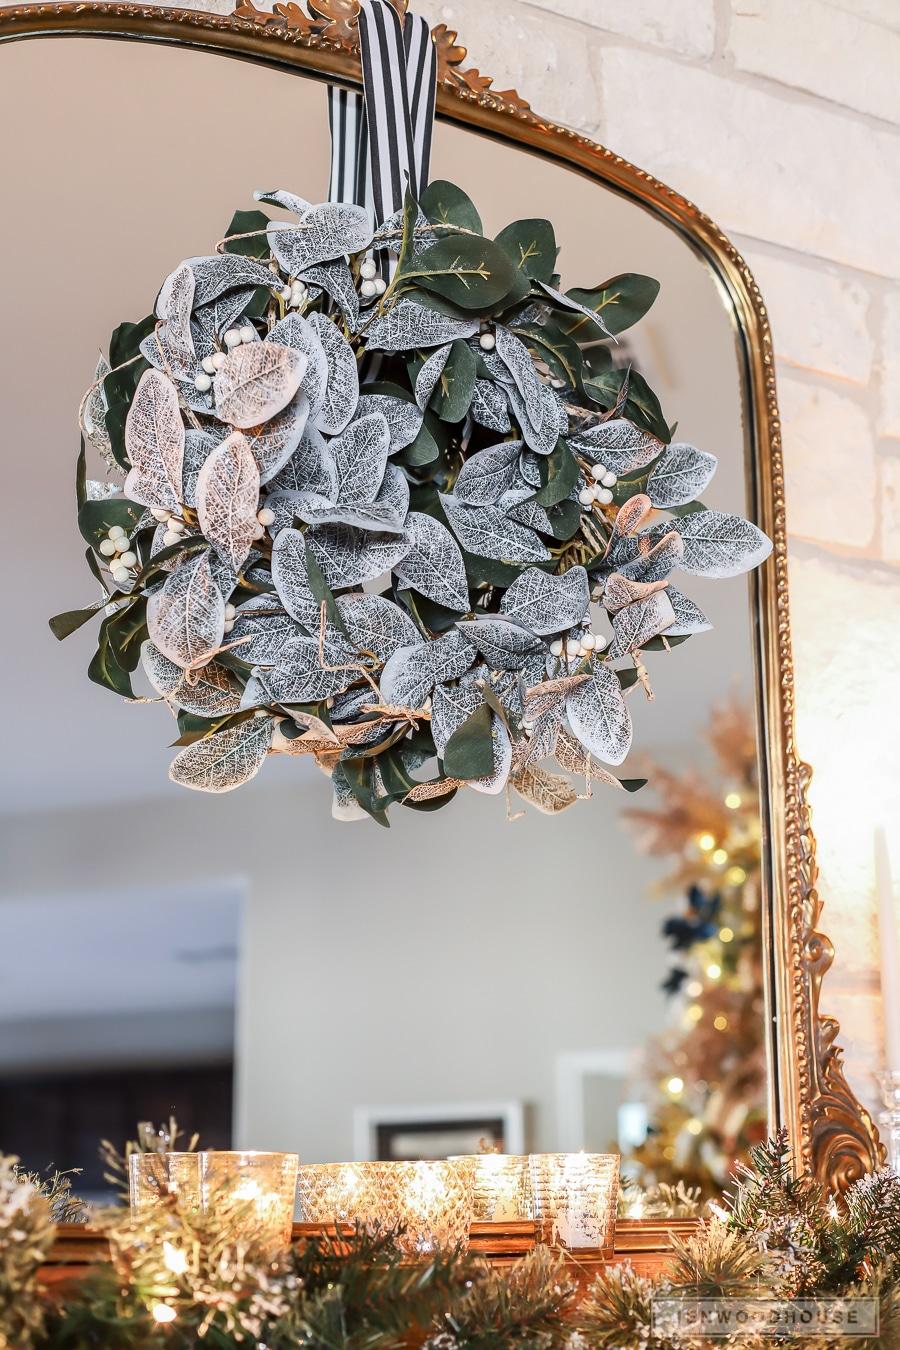 Magnolia wreath and antique mirror over mantel